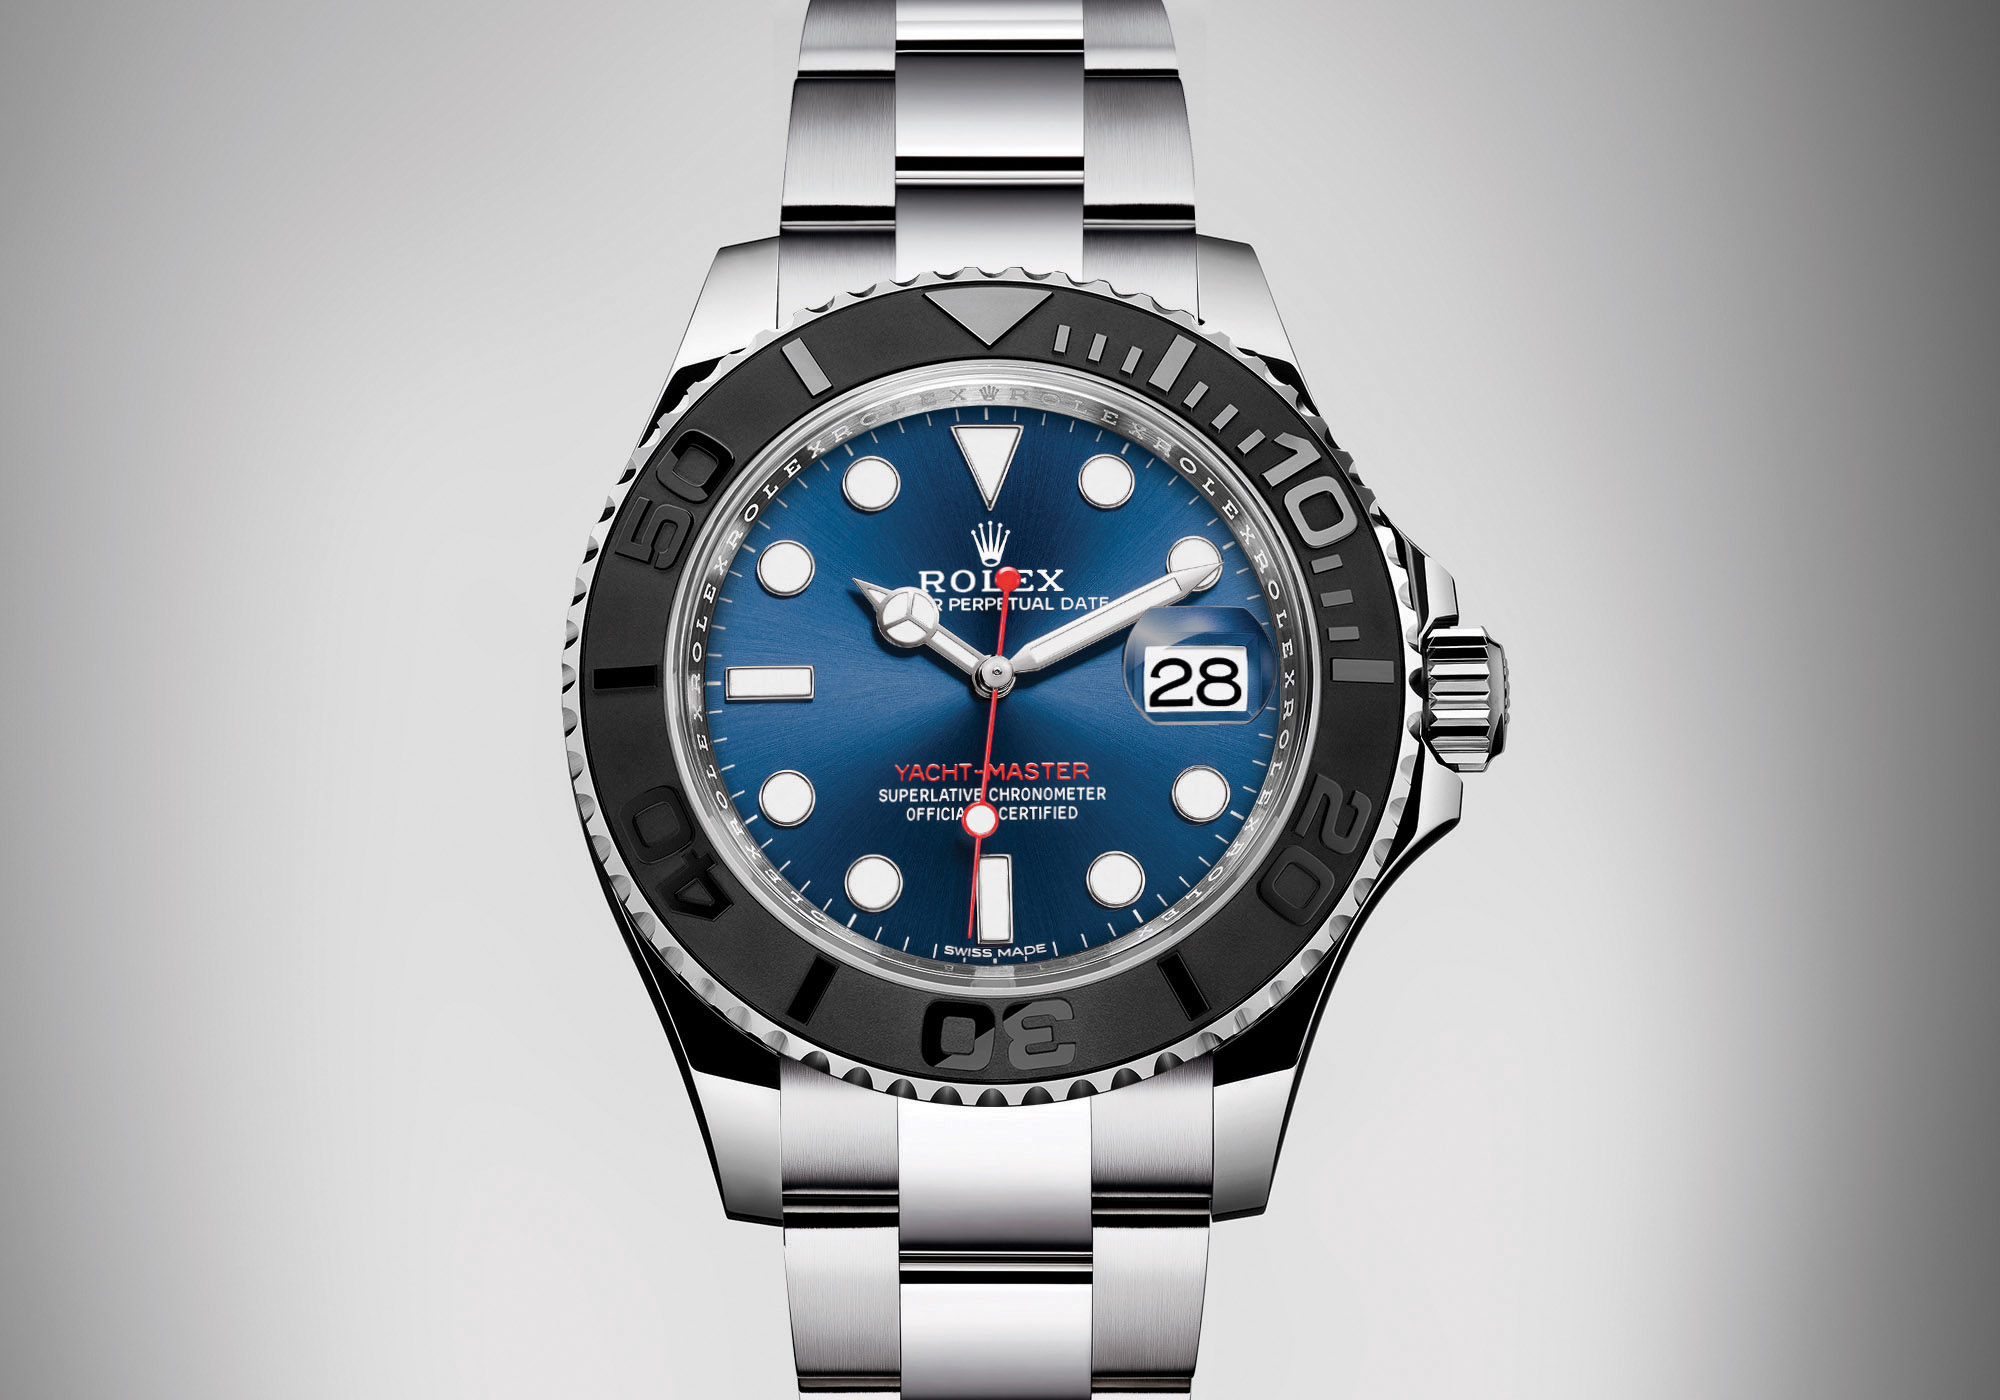 Rolex Yacht Master Steel Ceramic Bezel Blue Dial bracelet - Rolex Baselworld 2017 - Rolex Predictions 2017